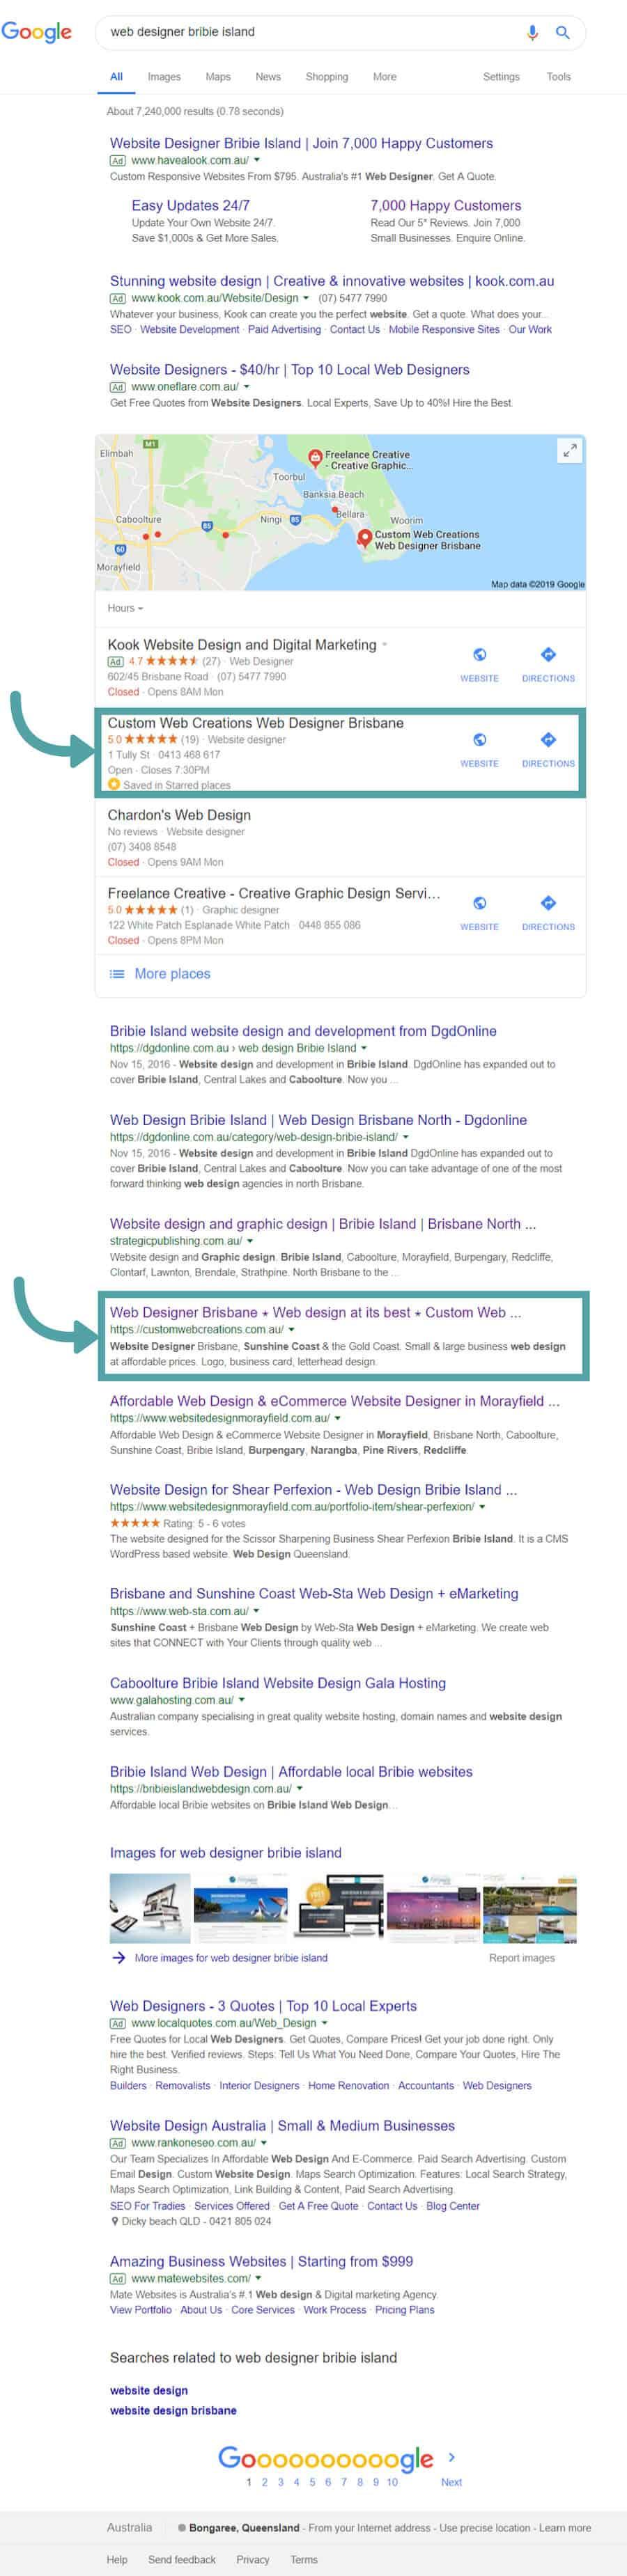 google my business listing-1